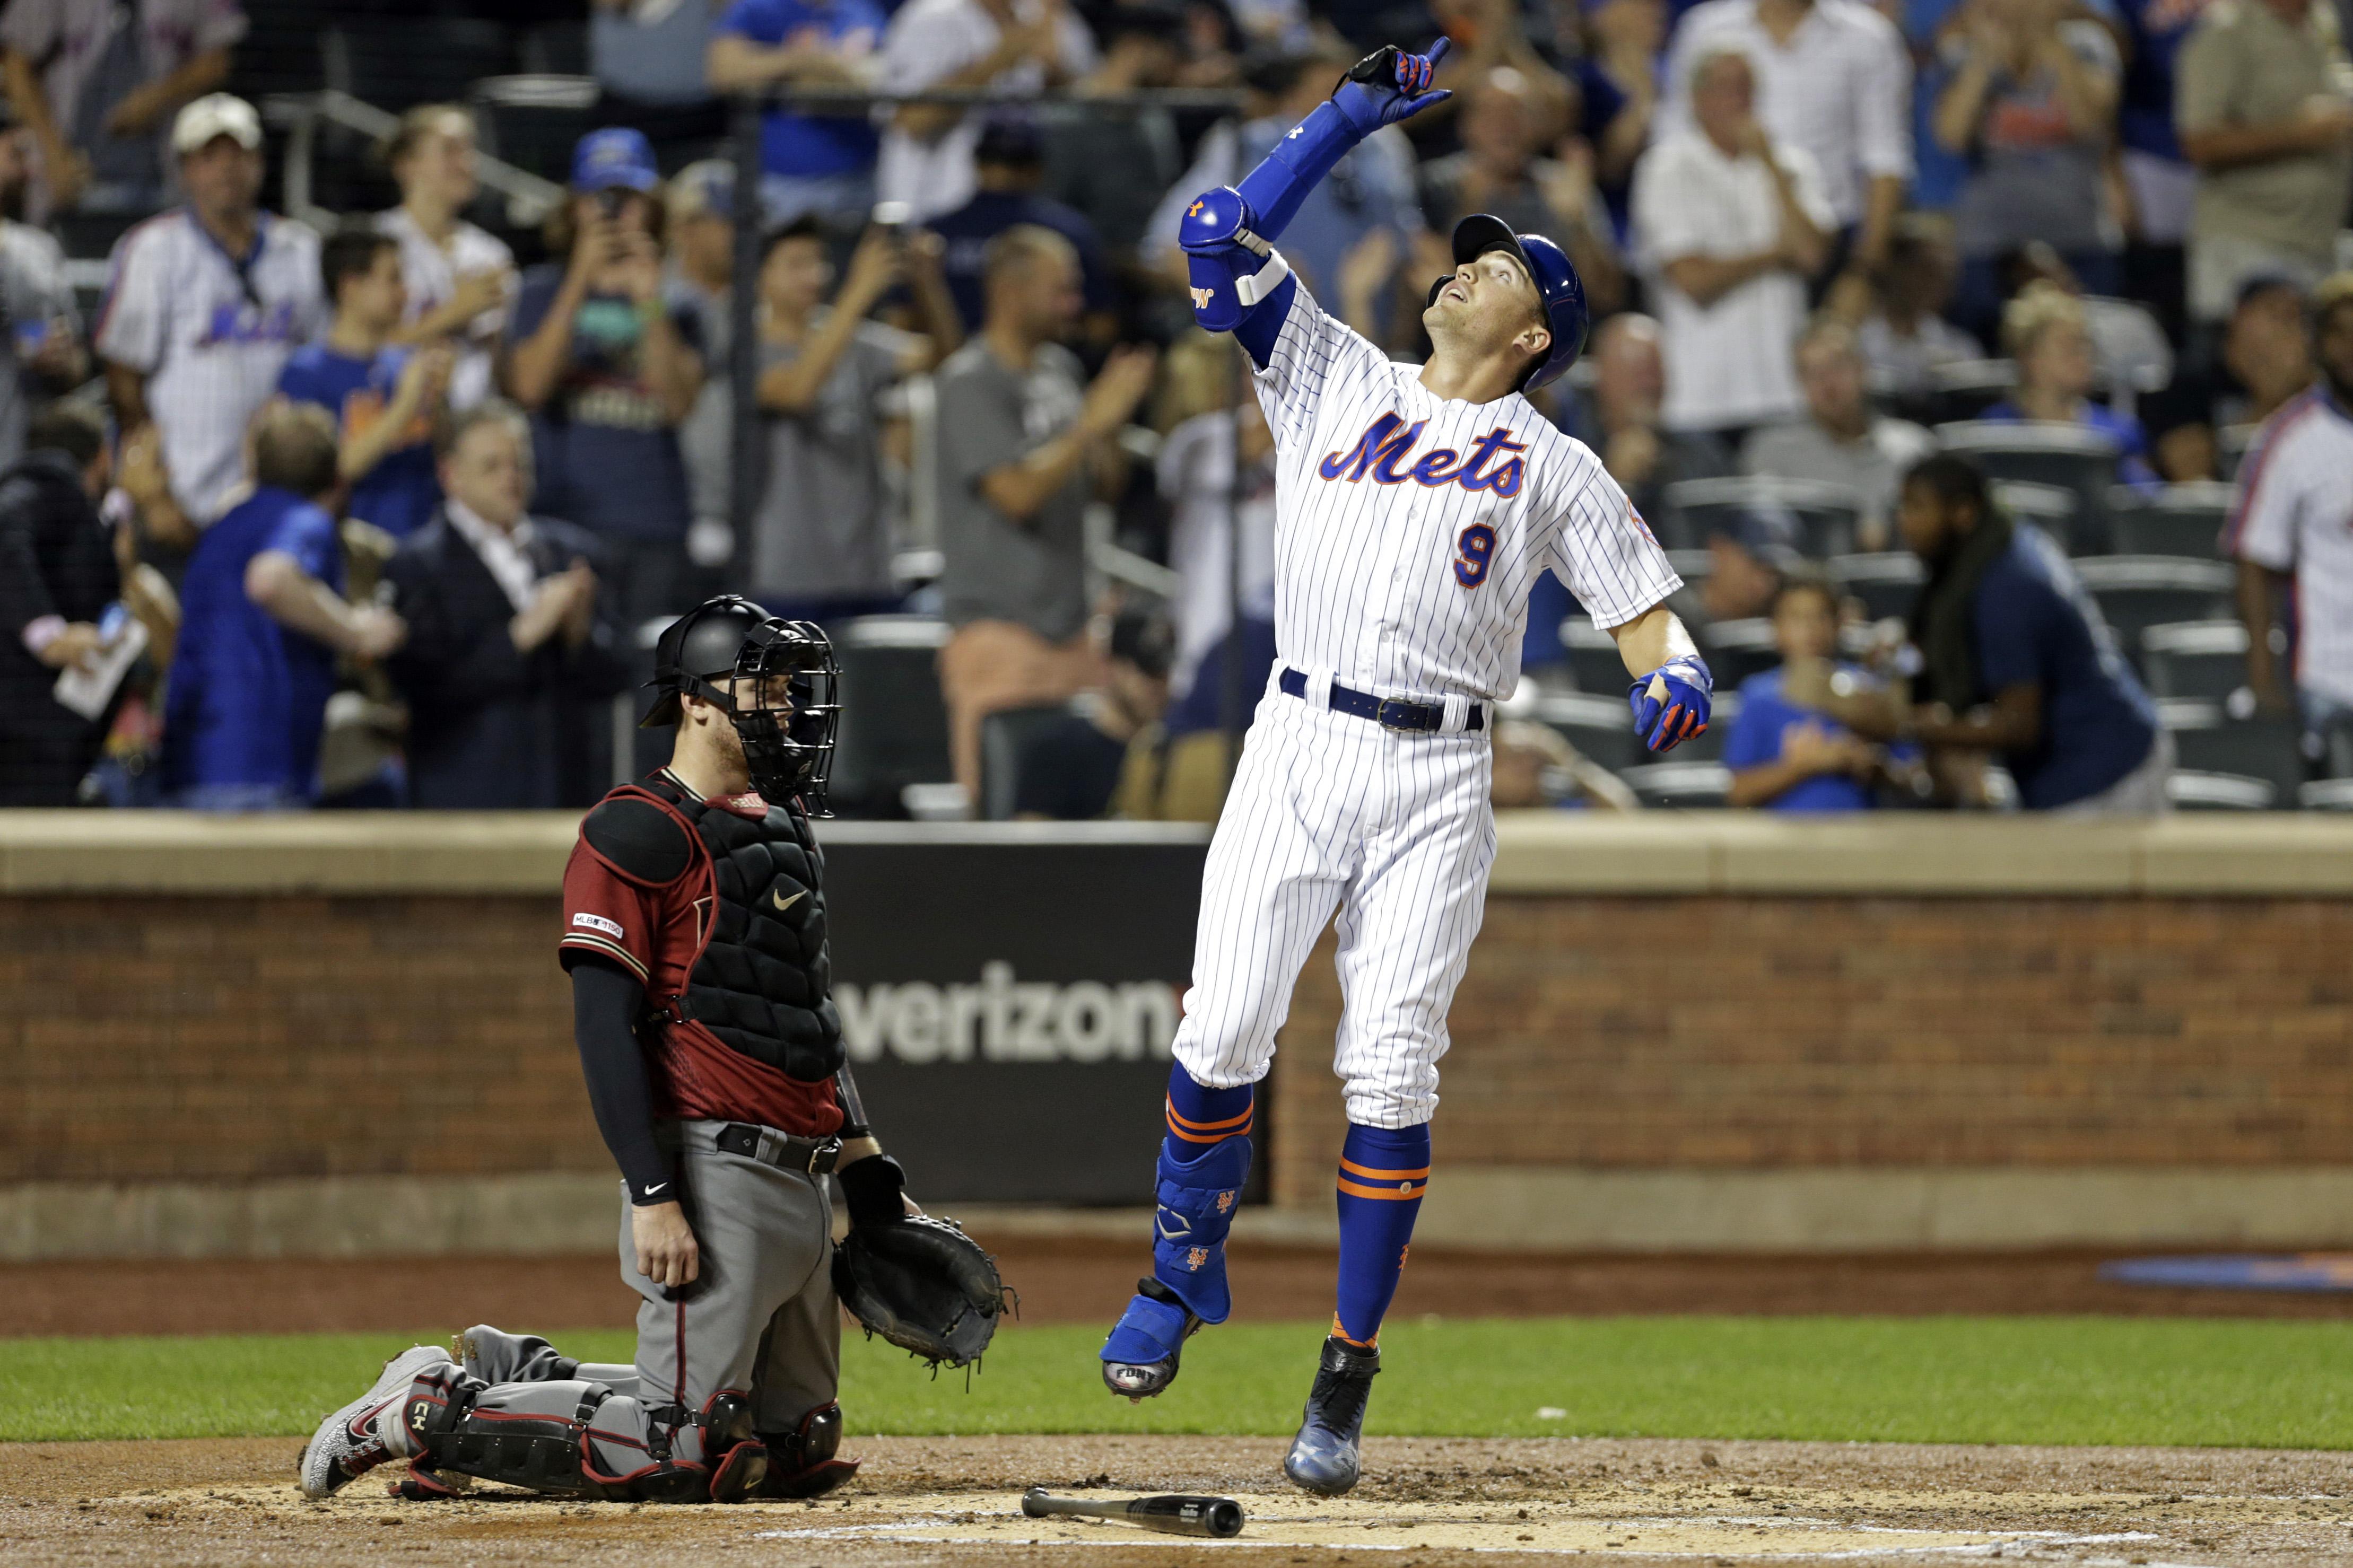 9/12/19 Game Preview: Arizona Diamondbacks at New York Mets